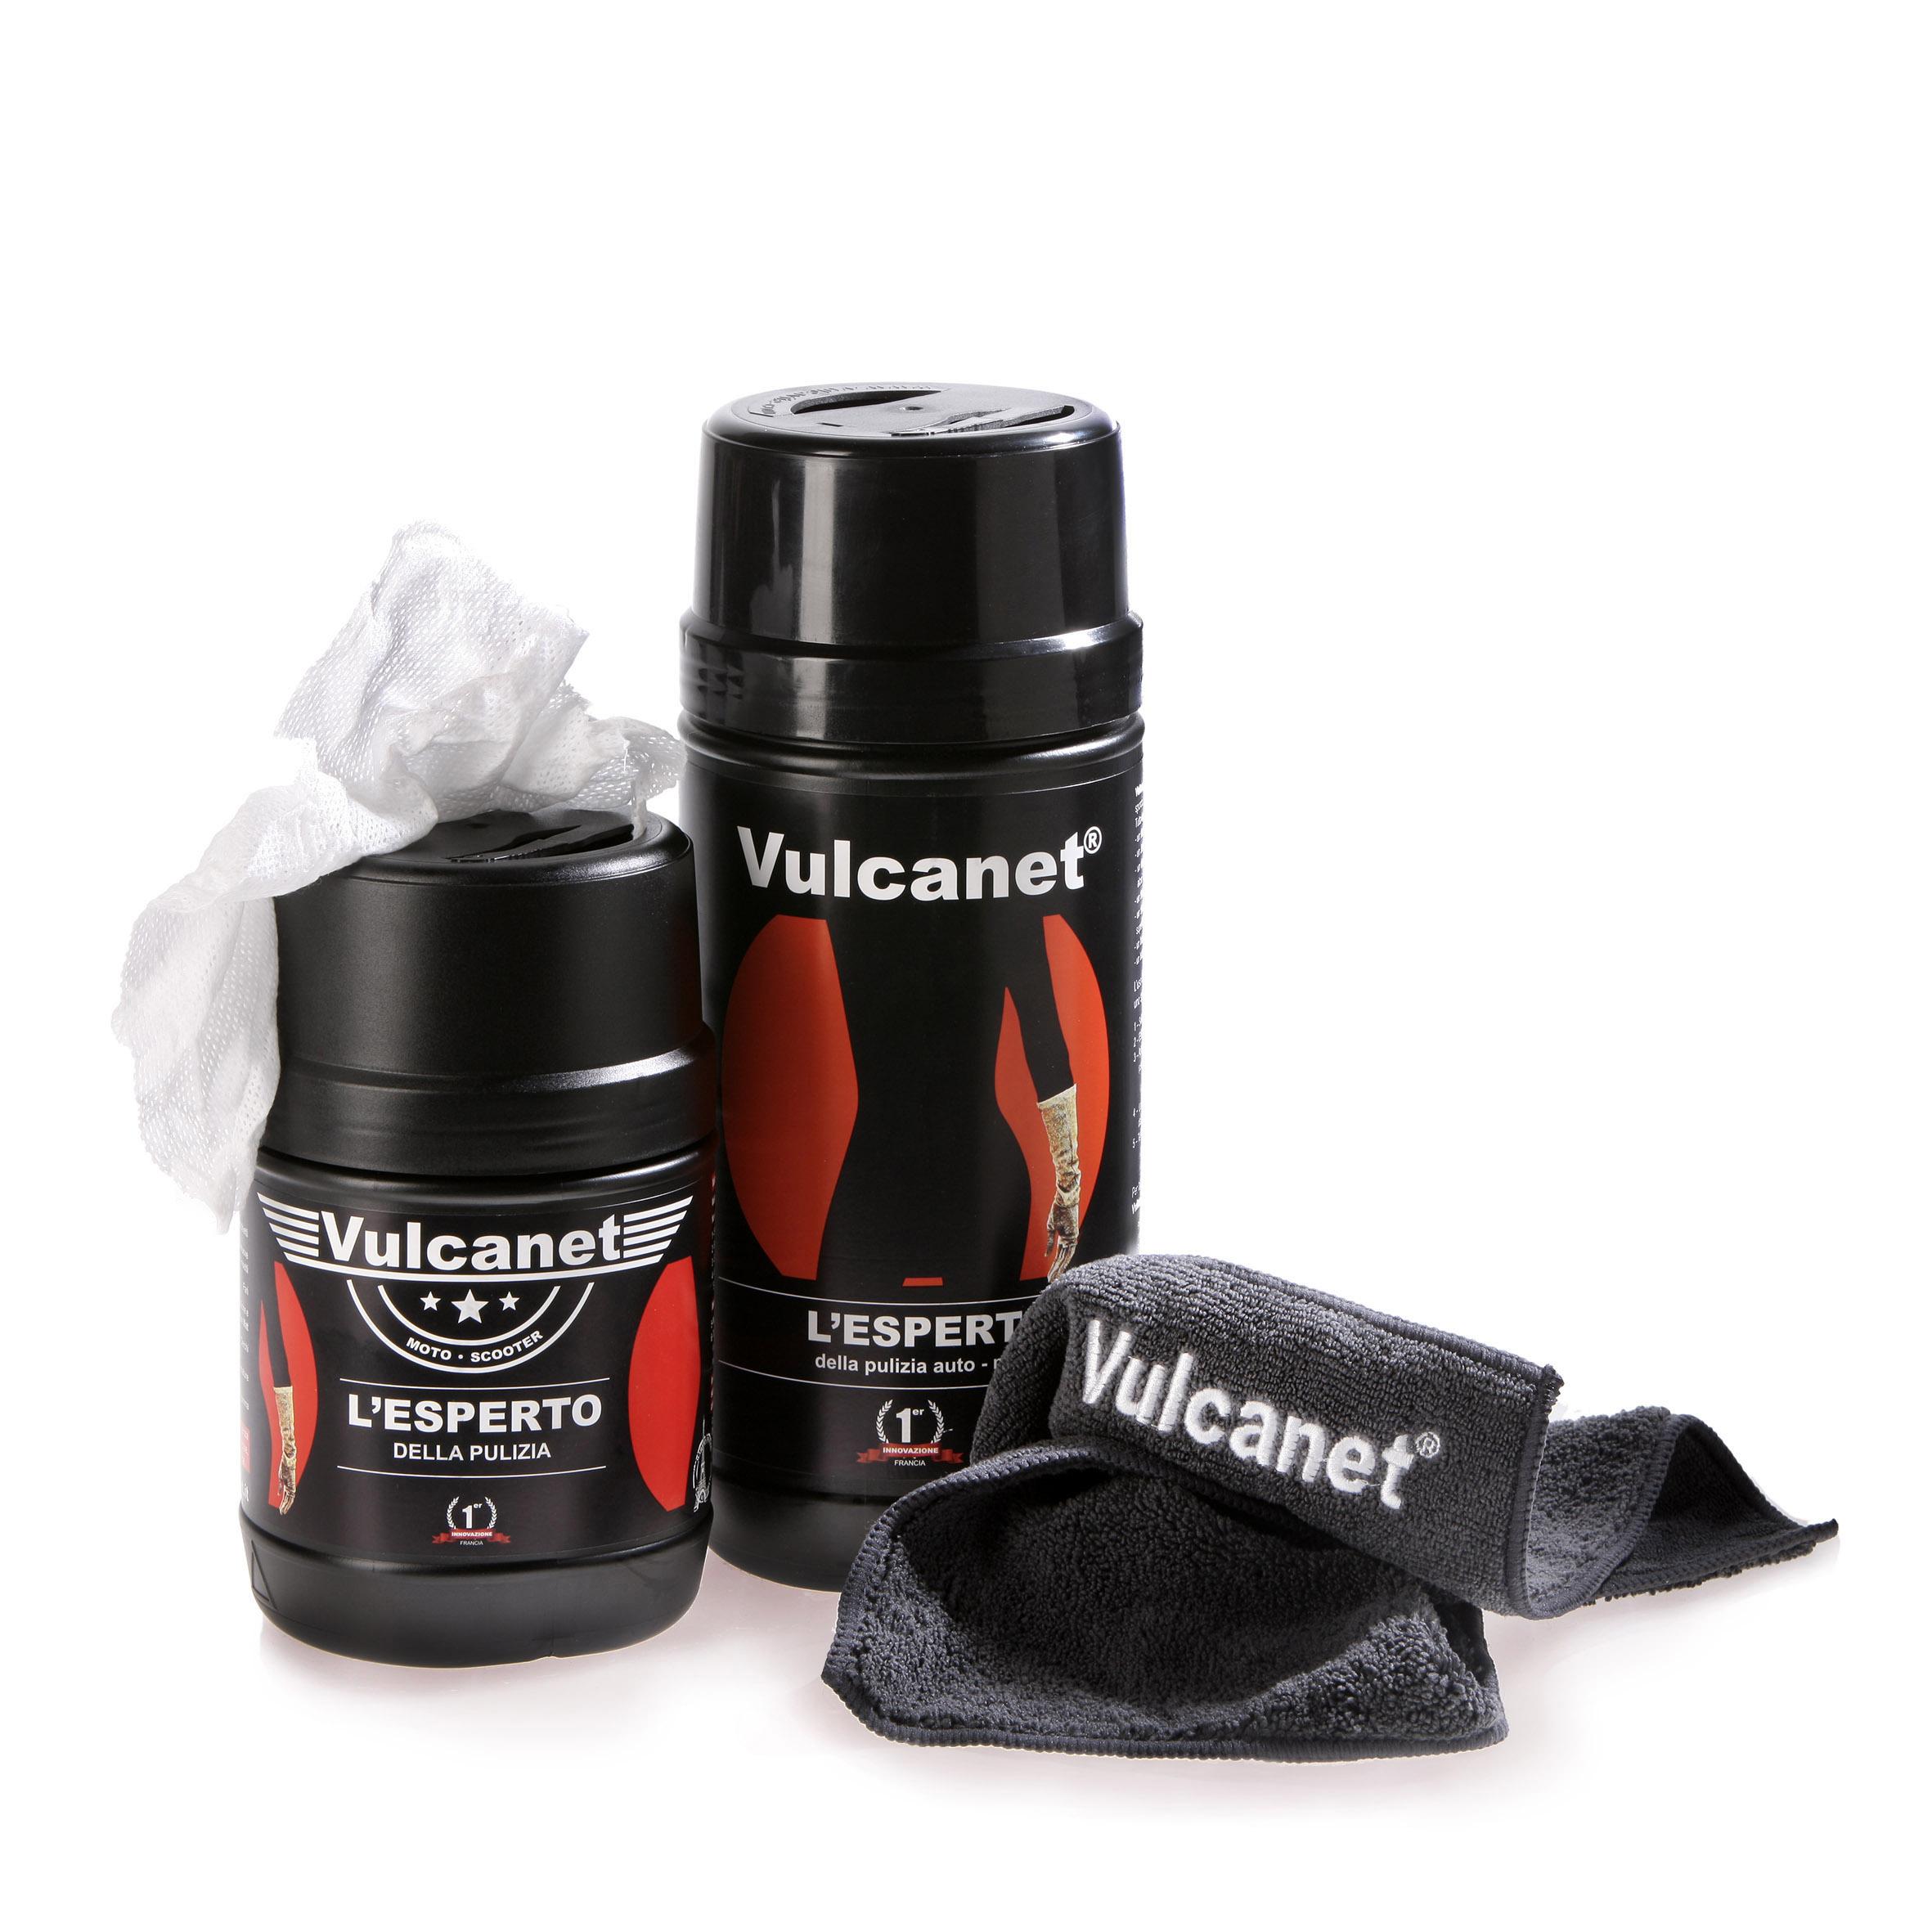 Vulcanet®, la salviettina tecno-chic